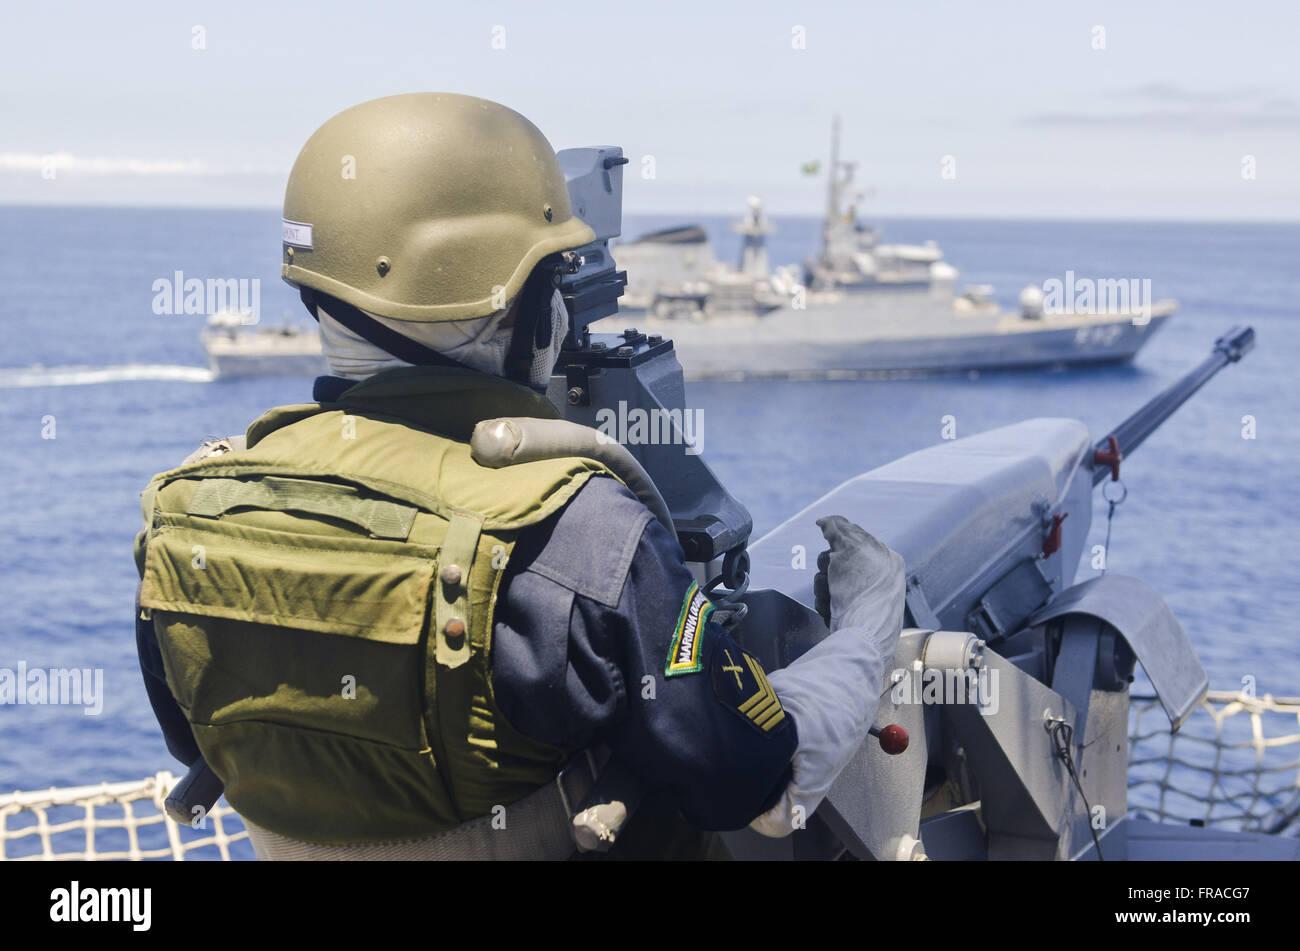 Chopper NDCC - Landing Ship Car Combat Admiral Savoie - Stock Image